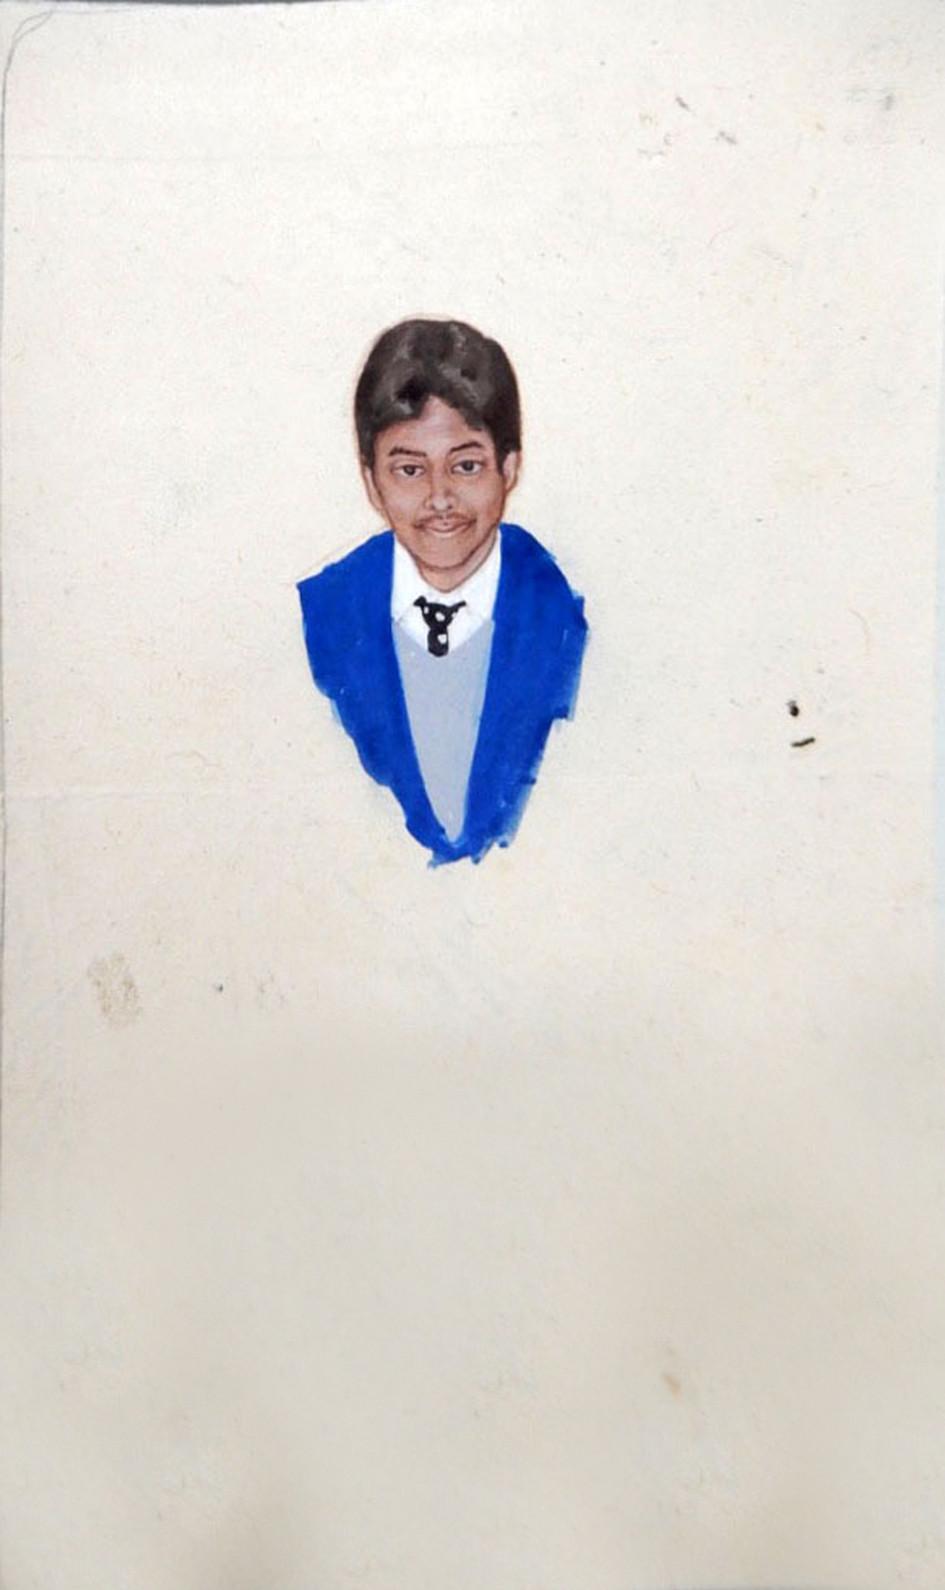 Portrait Study - Classroon II